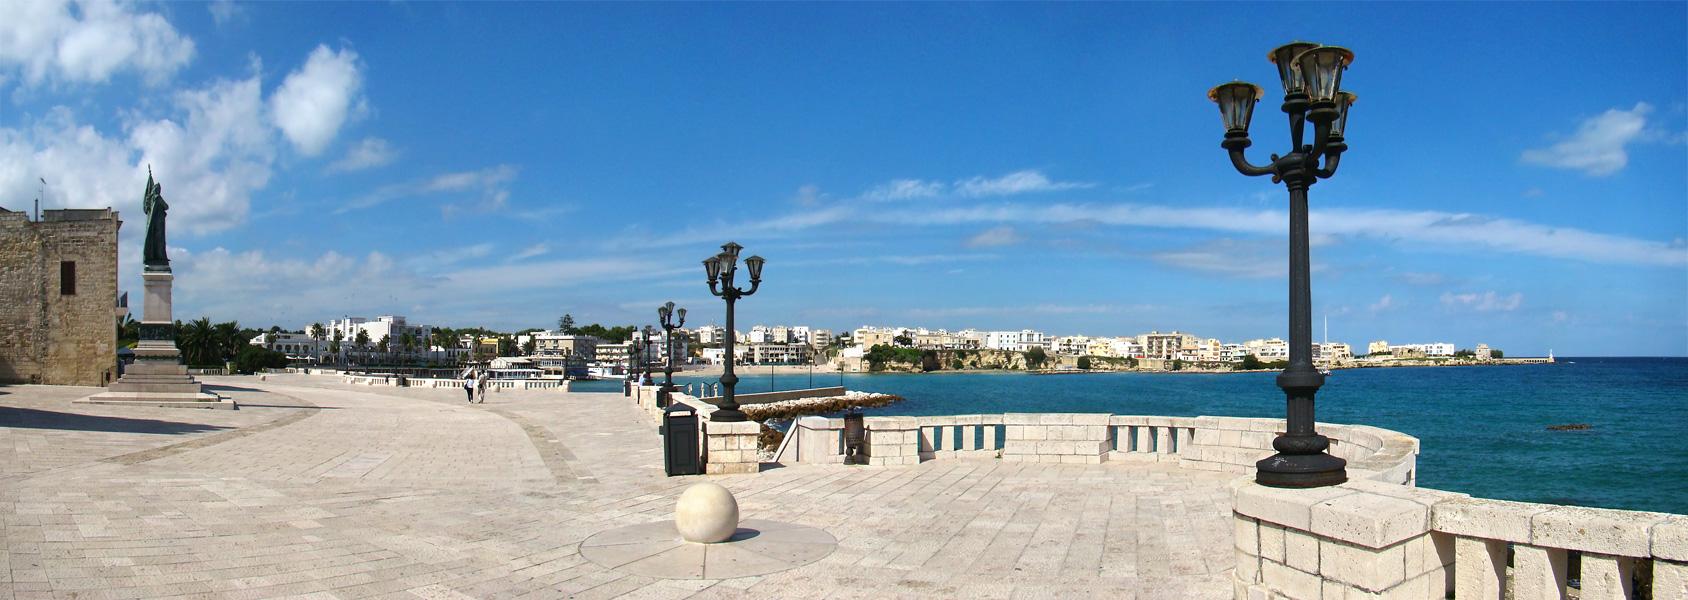 Otranto | Urban directory of Sud Italy